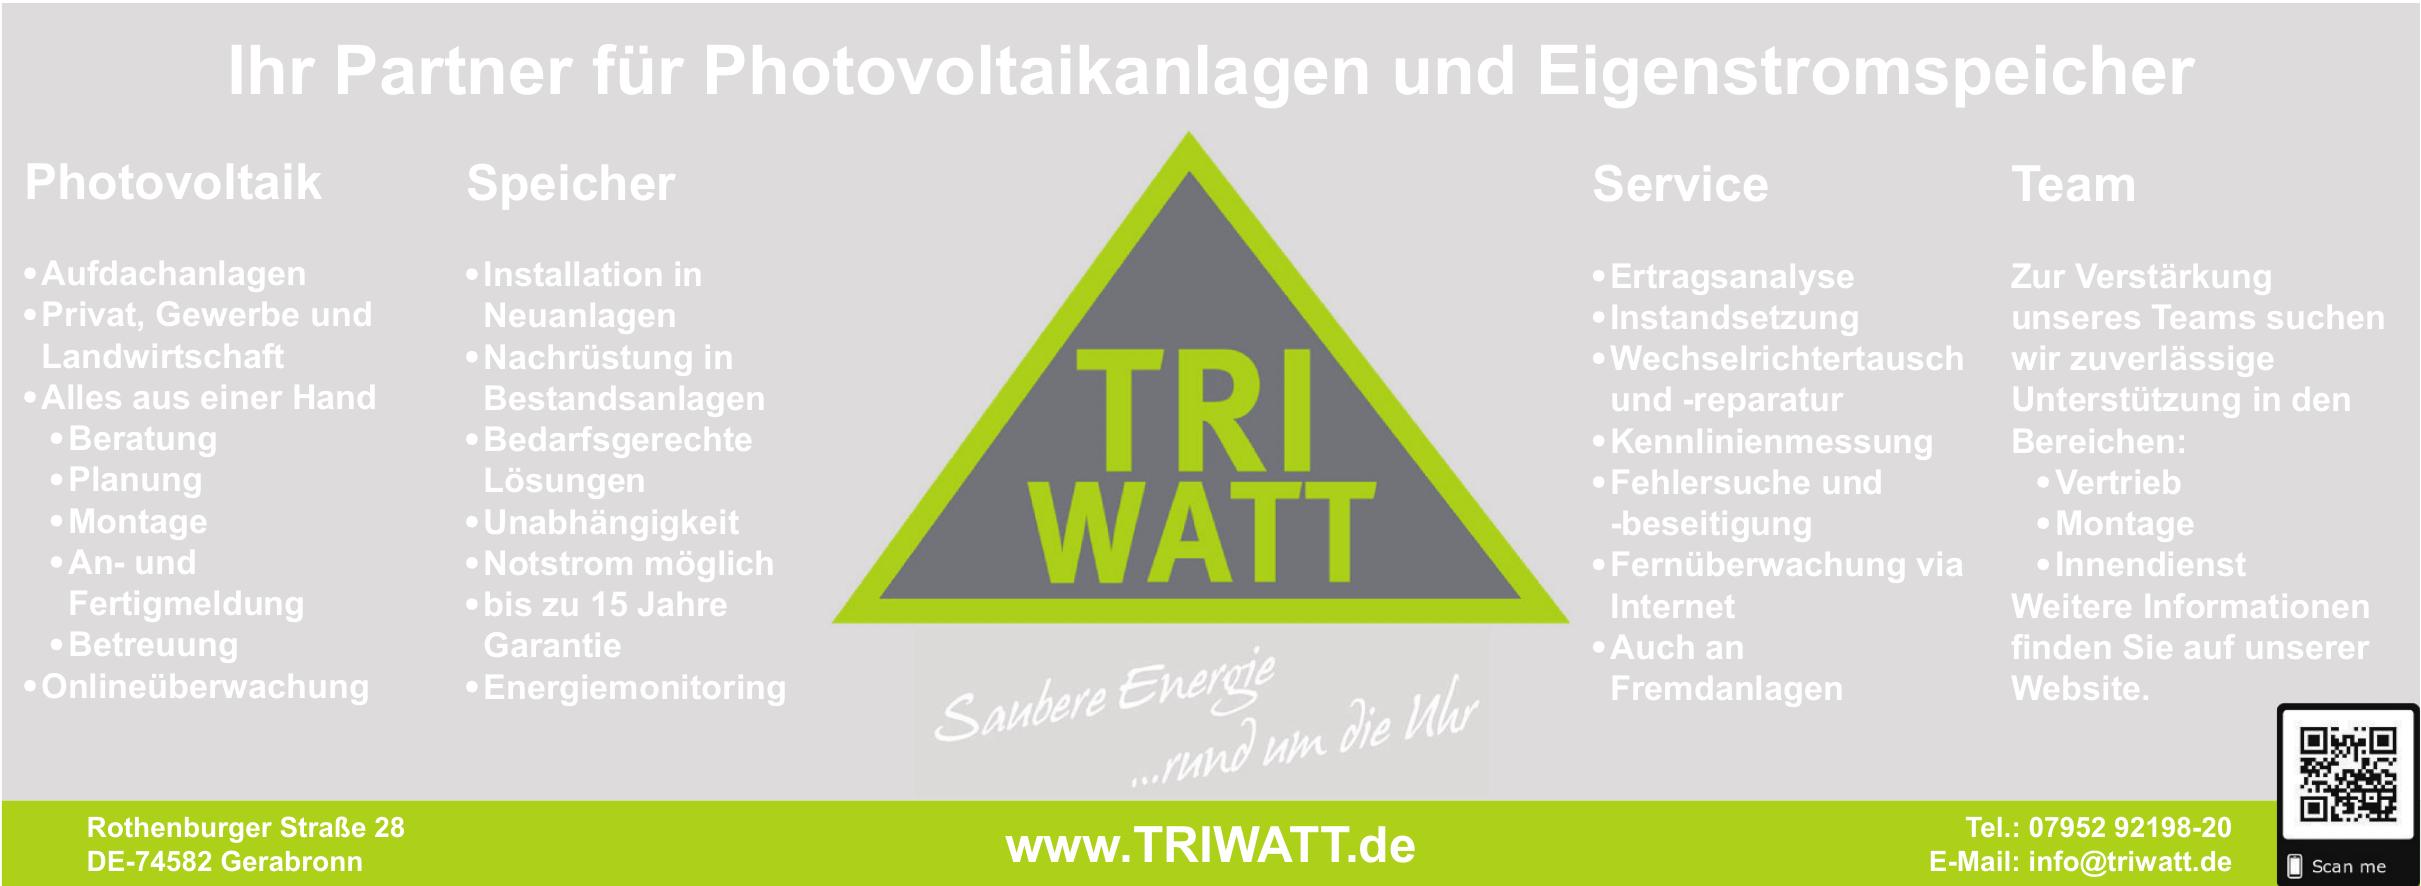 Fotovoltaikexperten der Tri Watt GmbH in Gerabronn beraten